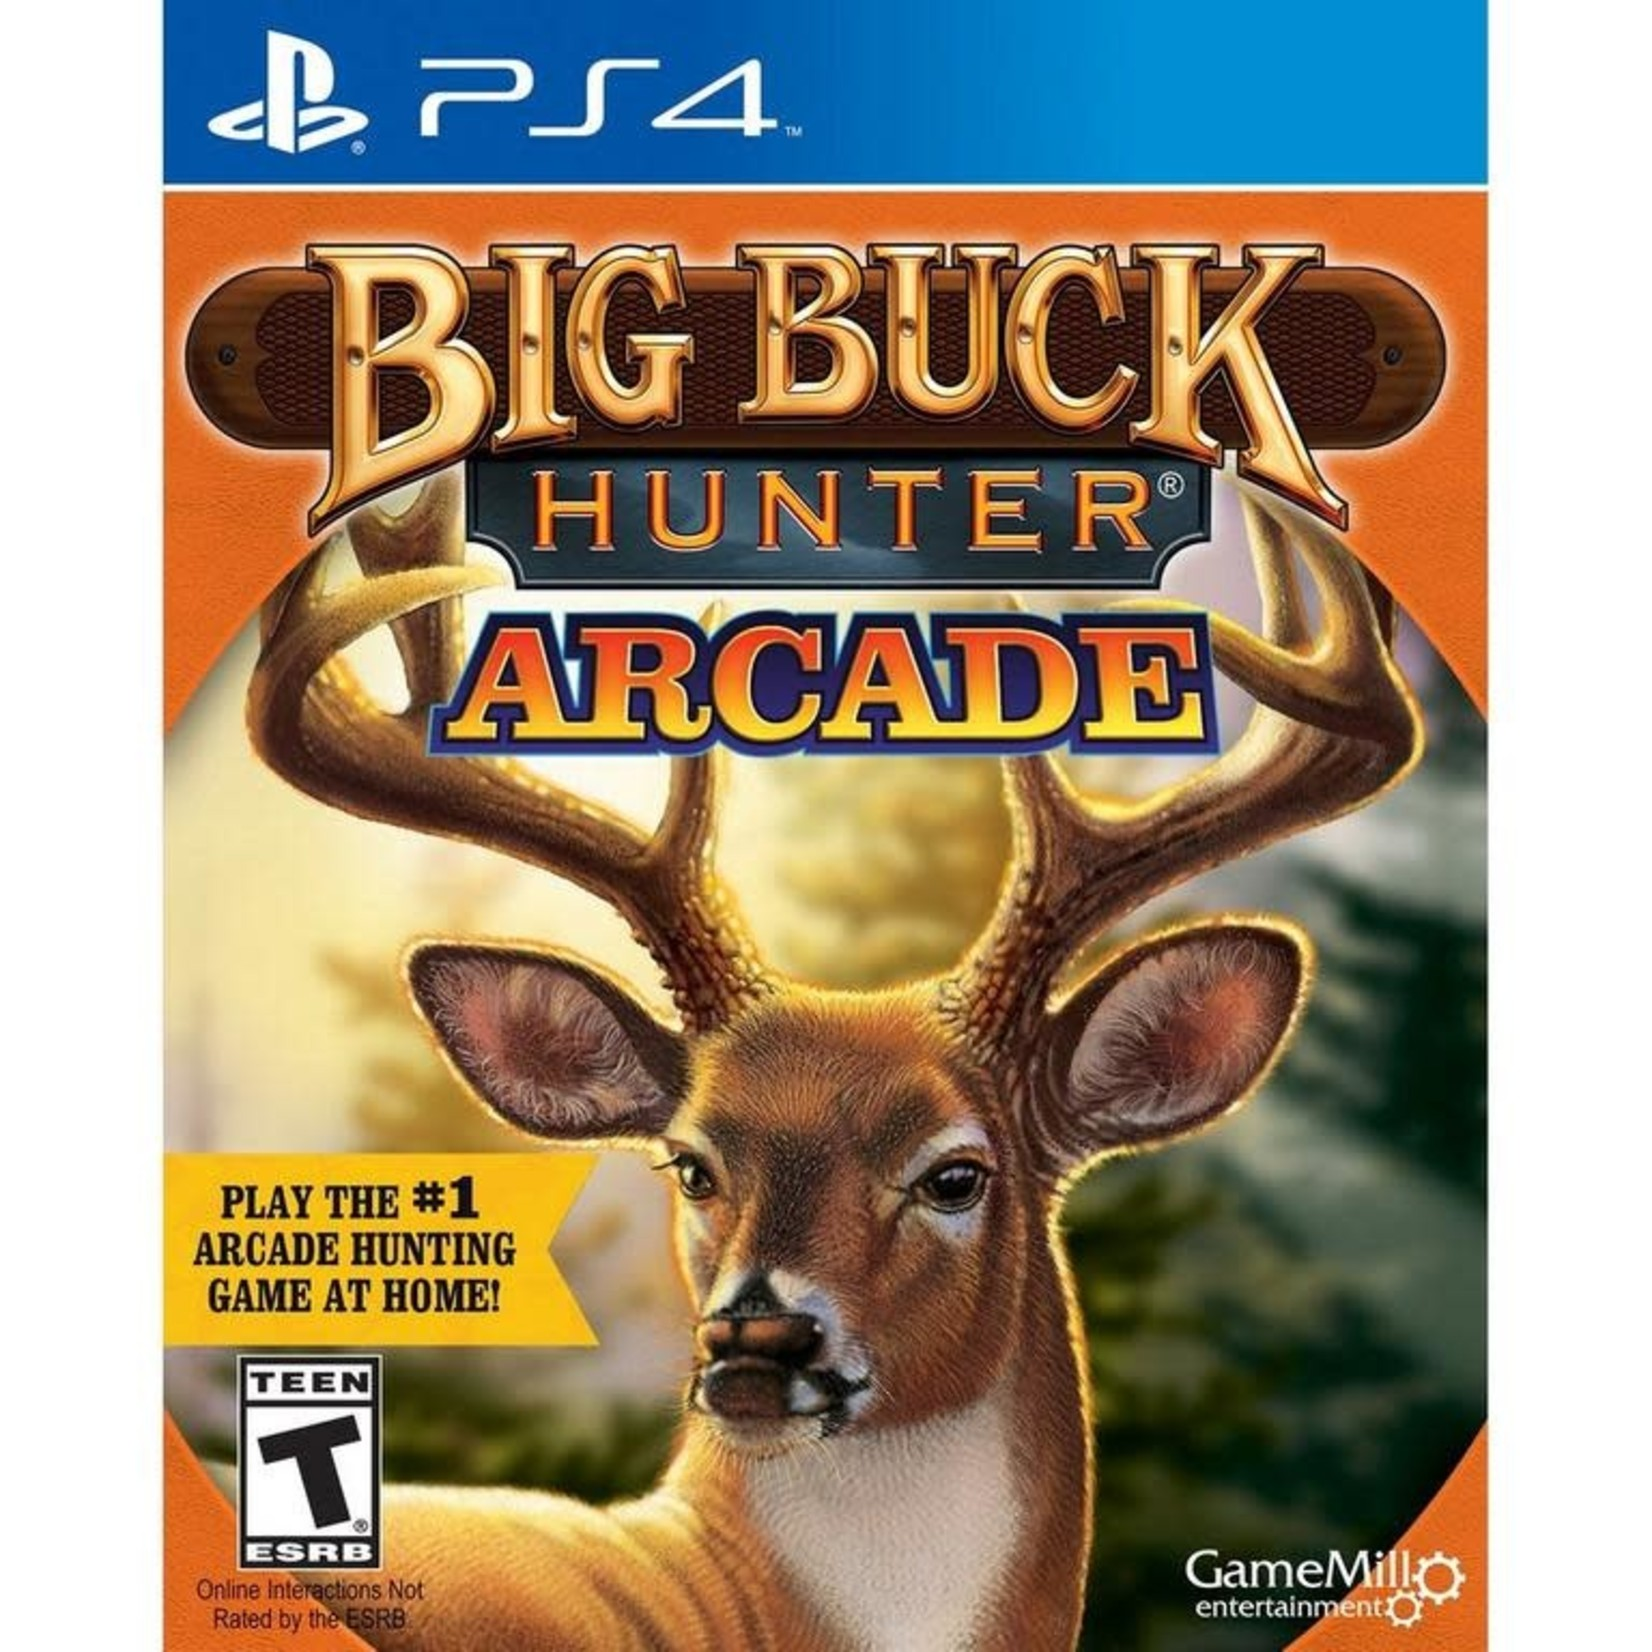 PS4U- Big Buck Hunter Arcade